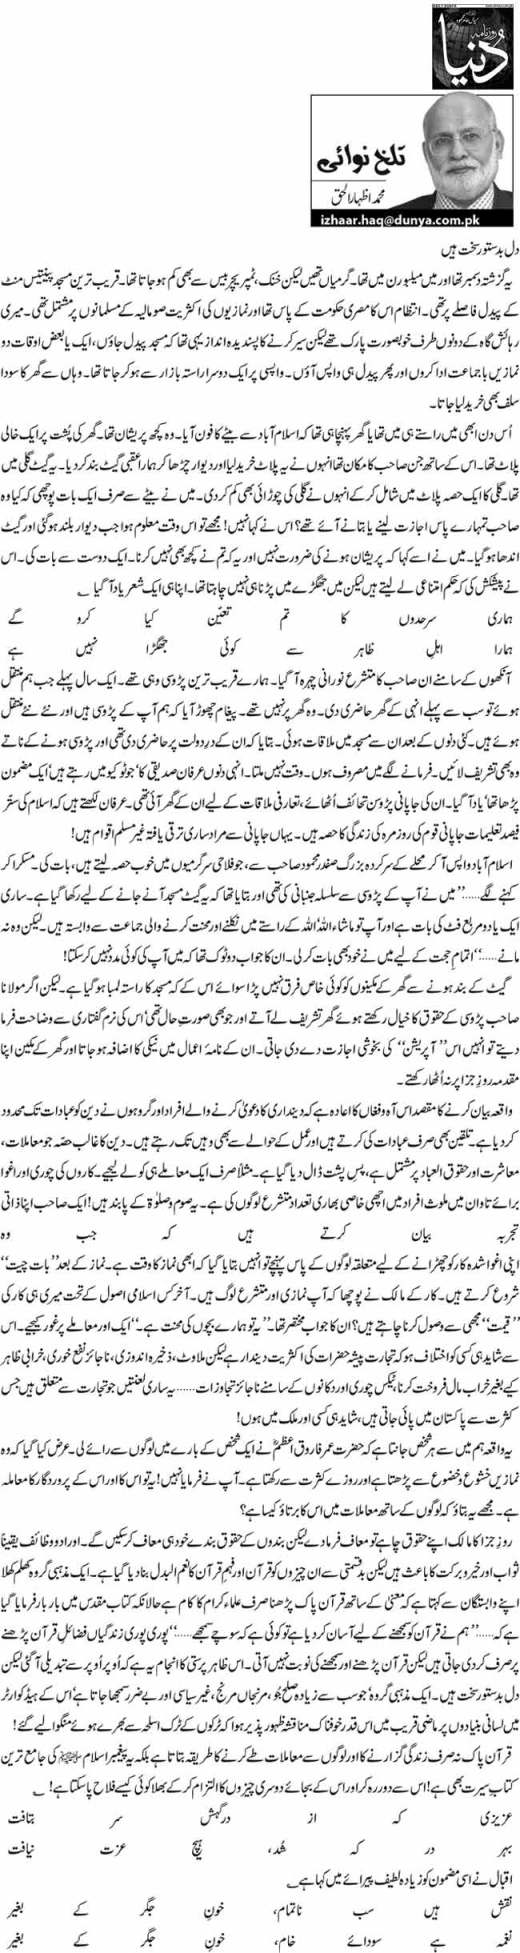 Dil badastoor sakht hain - M. Izhar ul Haq